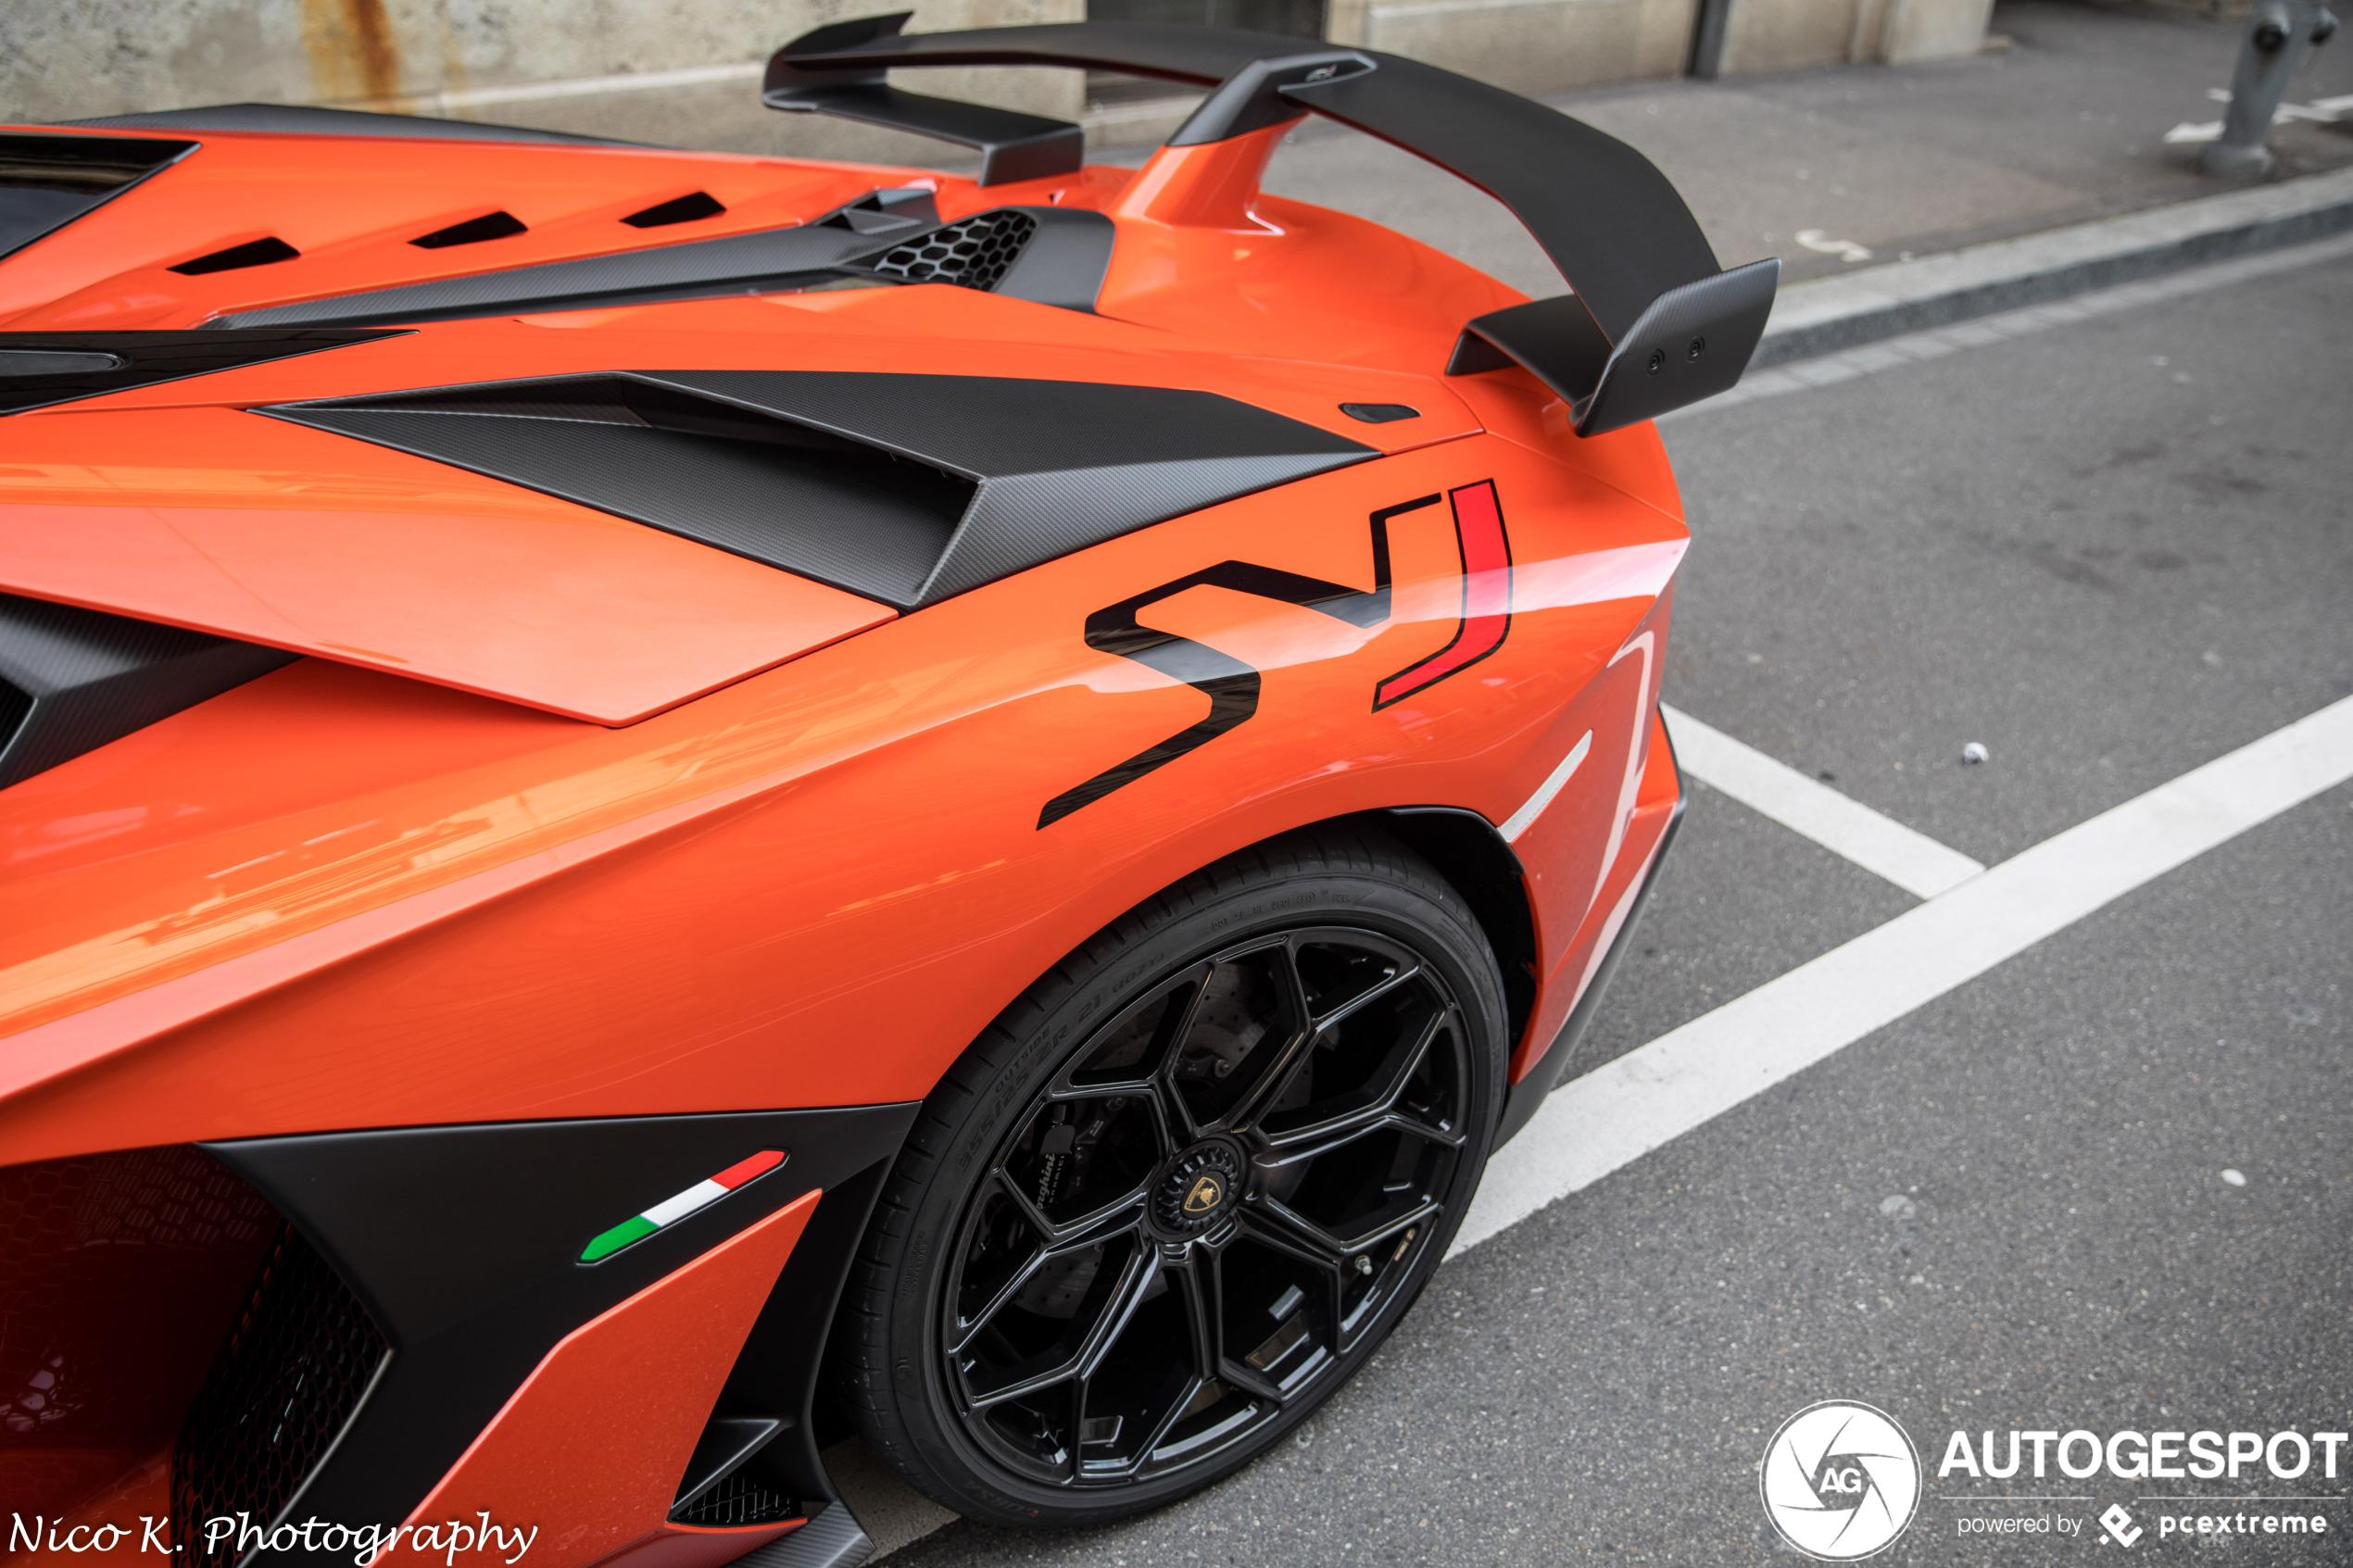 Lamborghini Aventador Lp770 4 Svj Roadster 22 February 2020 Autogespot